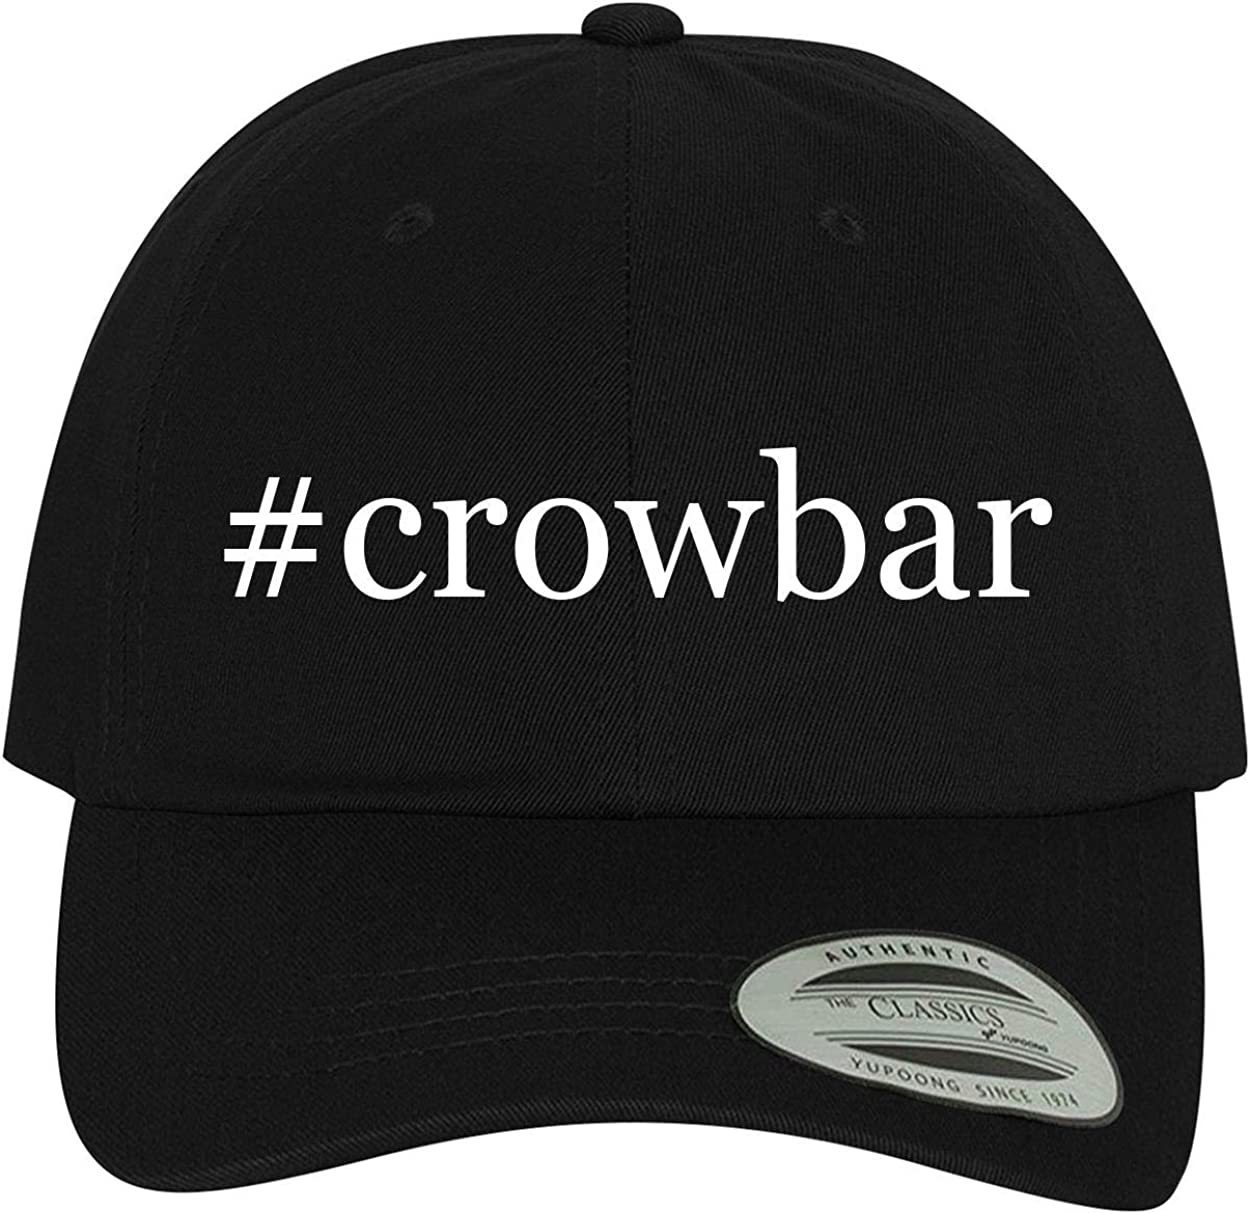 Comfortable Dad Hat Baseball Cap BH Cool Designs #Crowbar